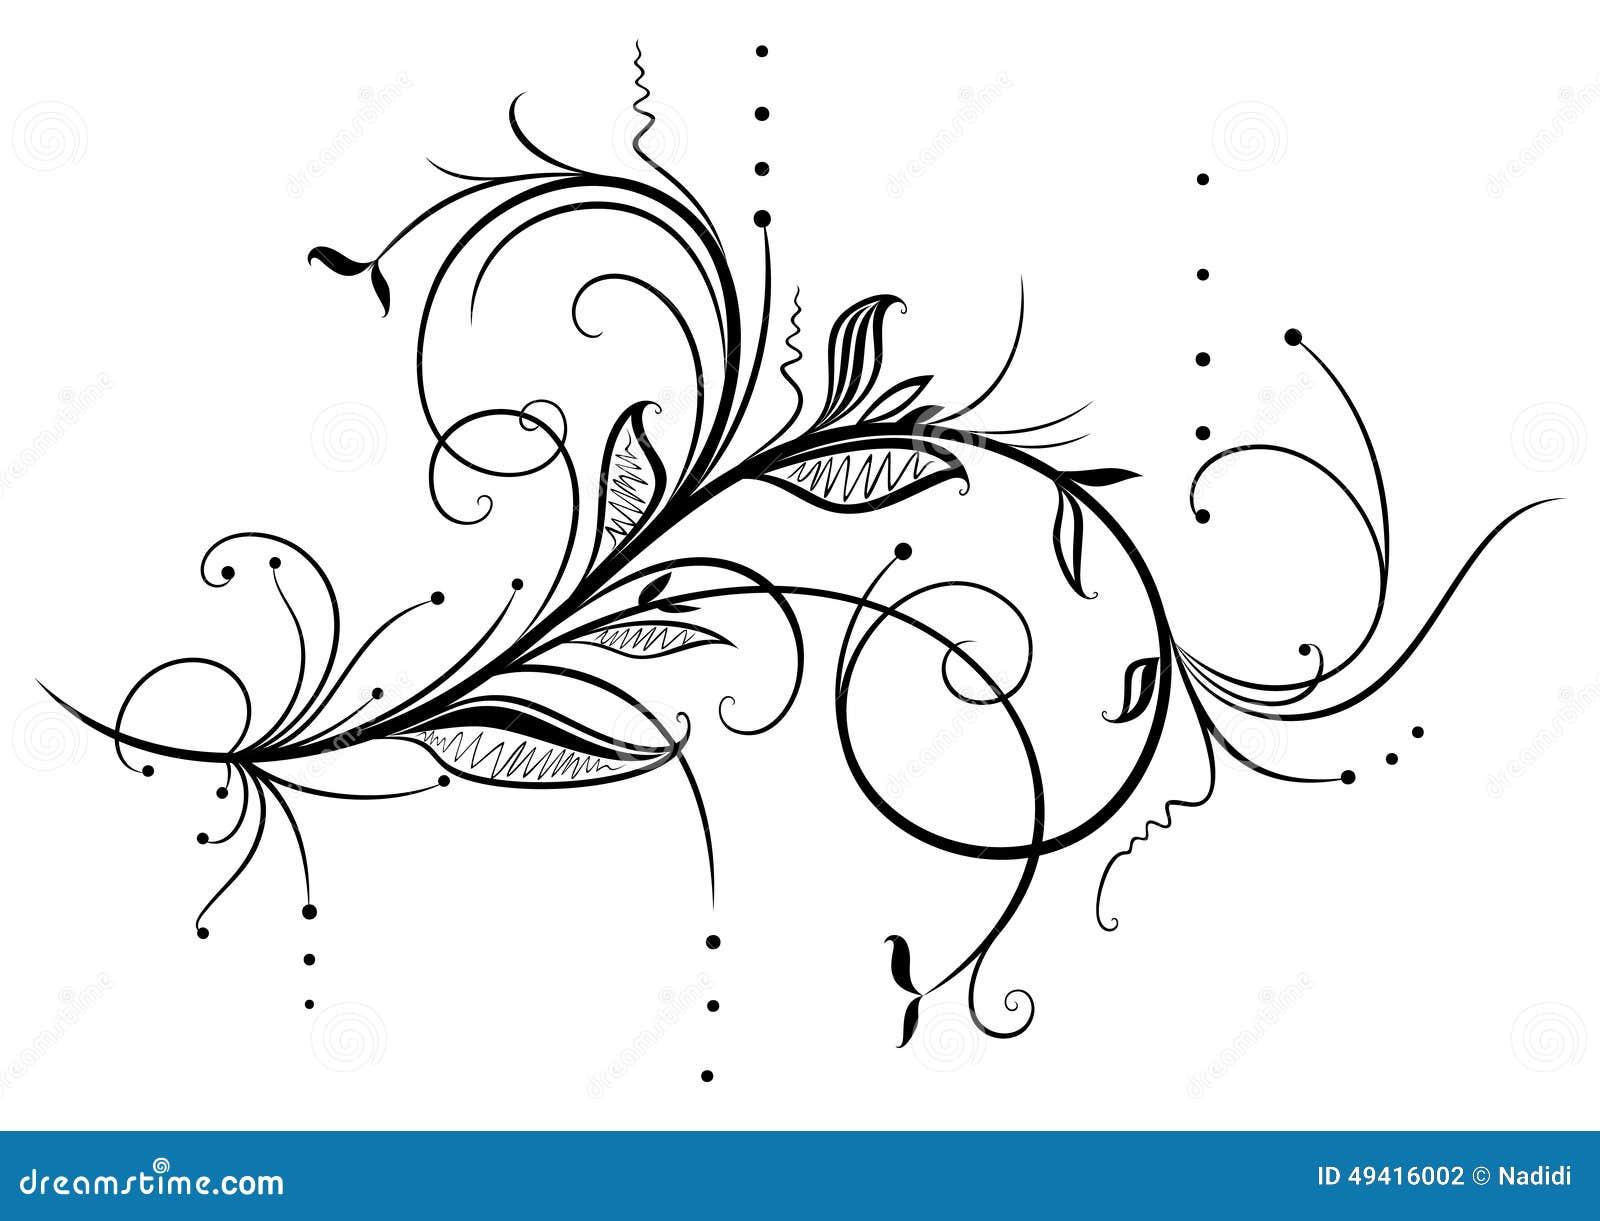 Download Abstraktes Muster vektor abbildung. Illustration von graphik - 49416002